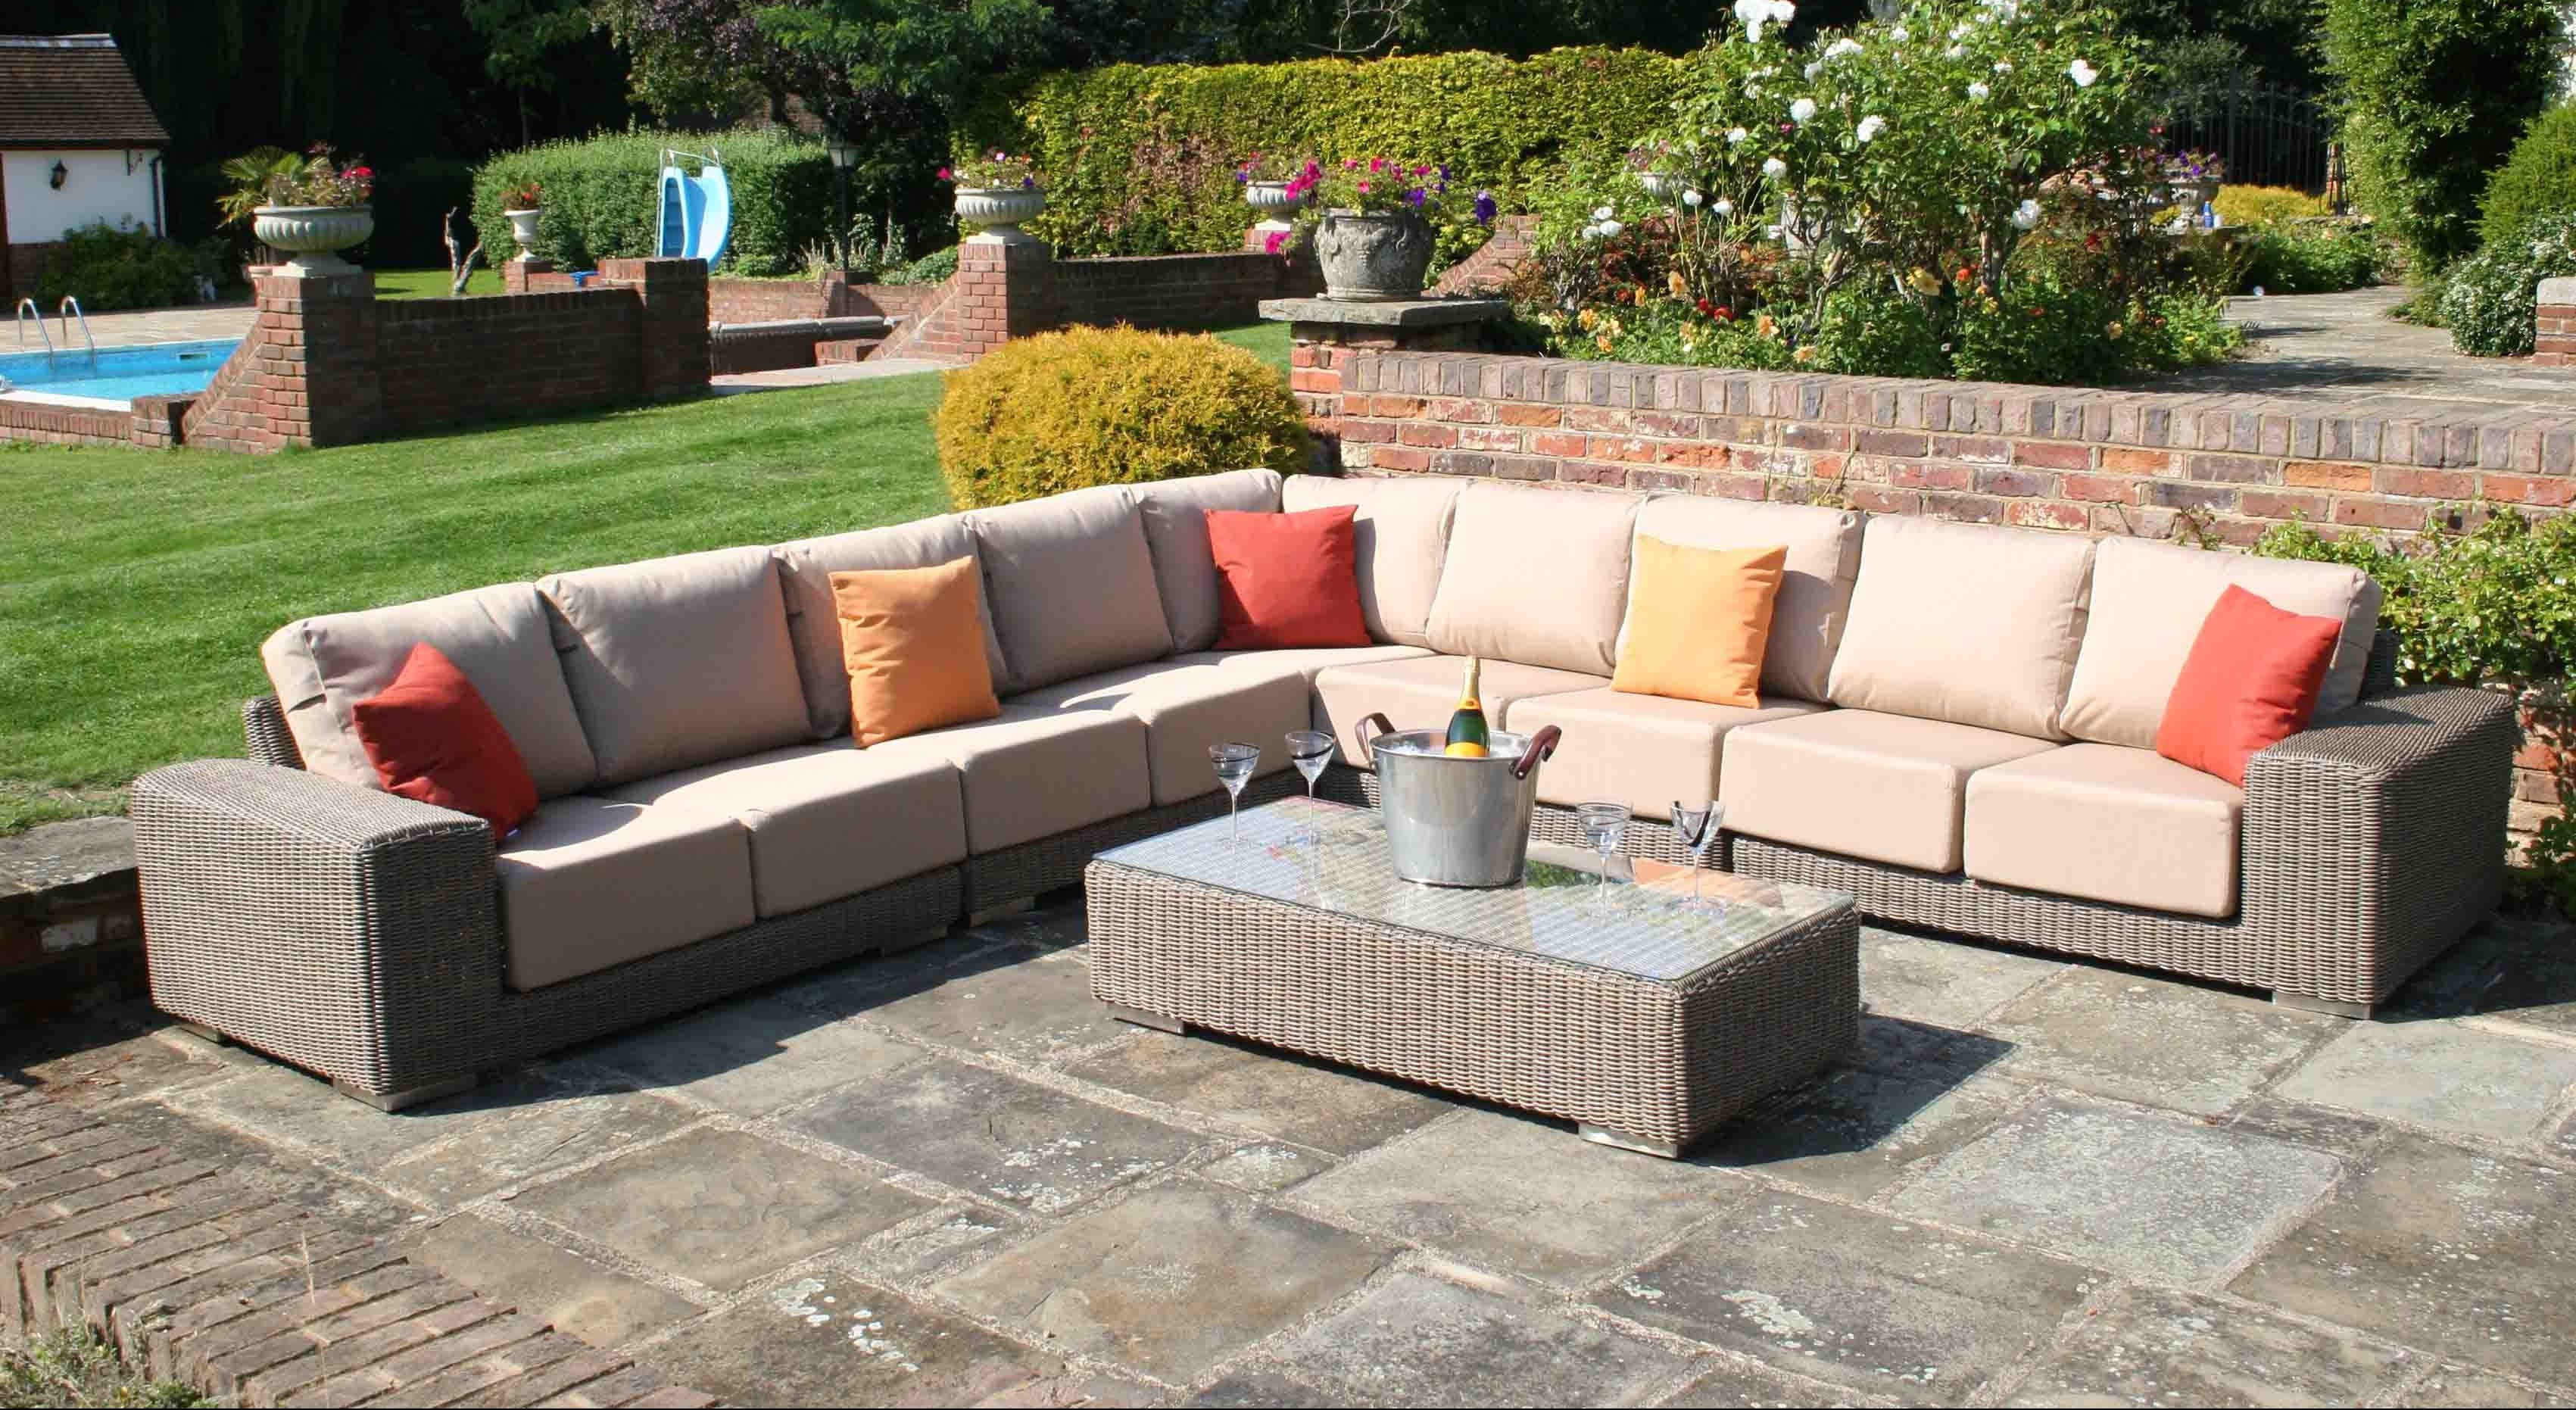 luxury rattan garden sofas - KINGSTON MODUALAR